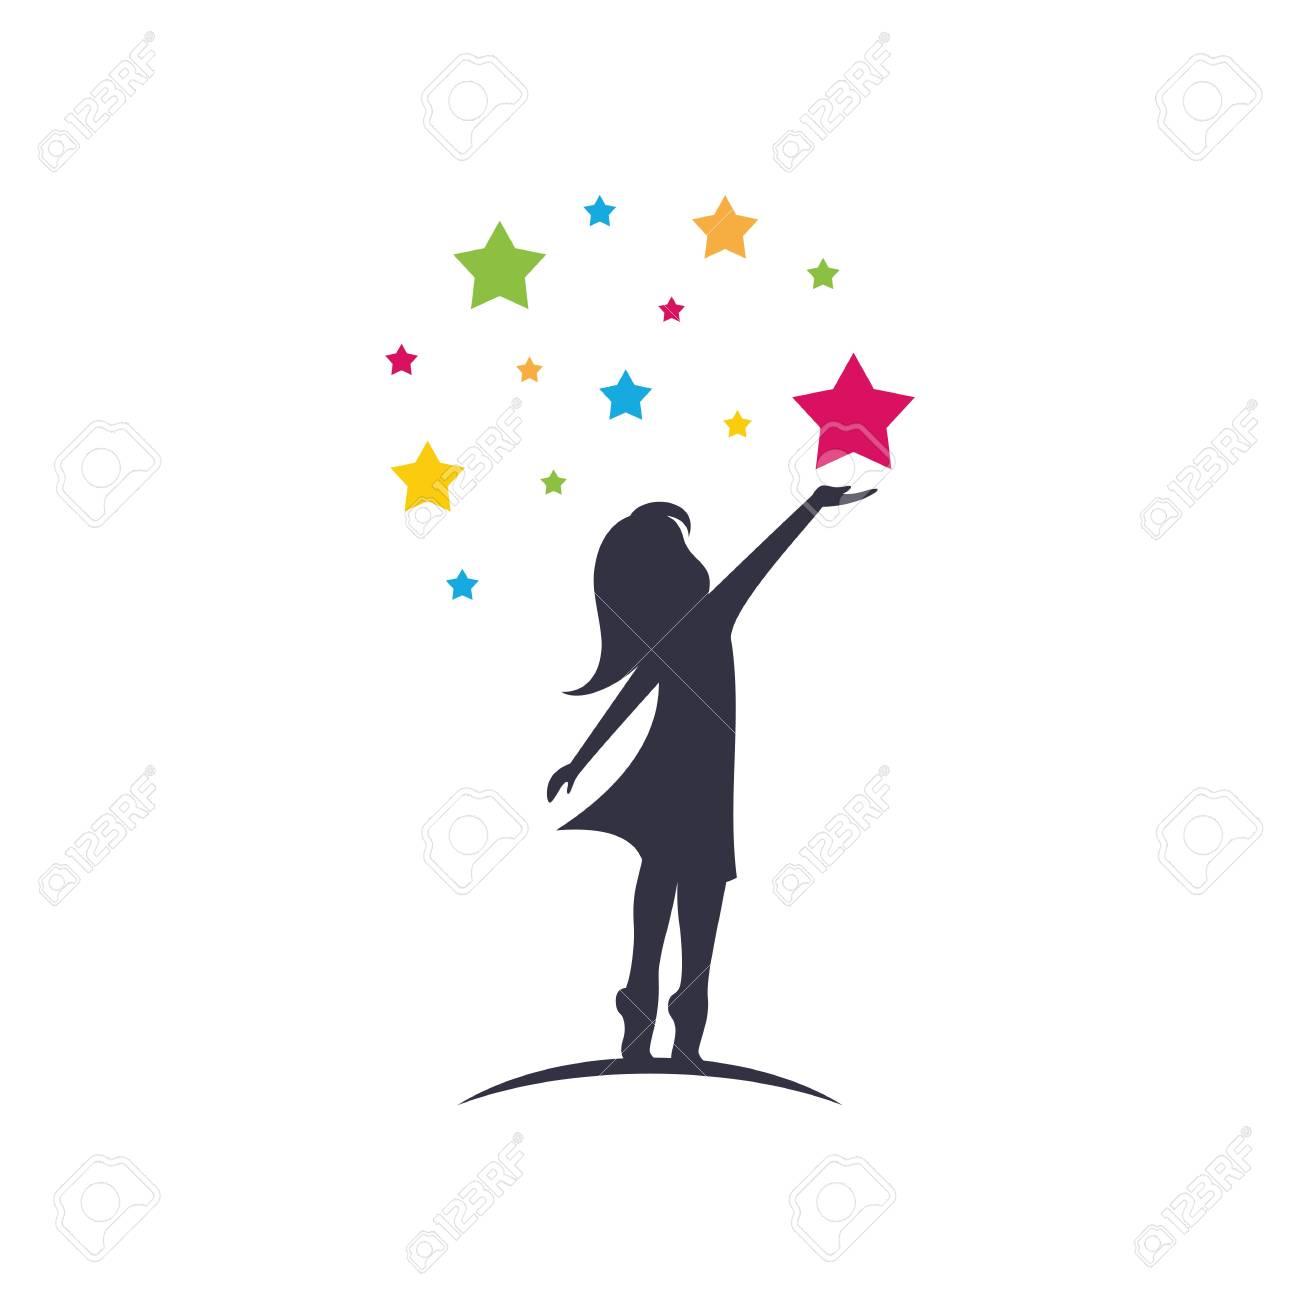 Little girl reach stars sillhouette logo template vector isolated on white background - 118732584